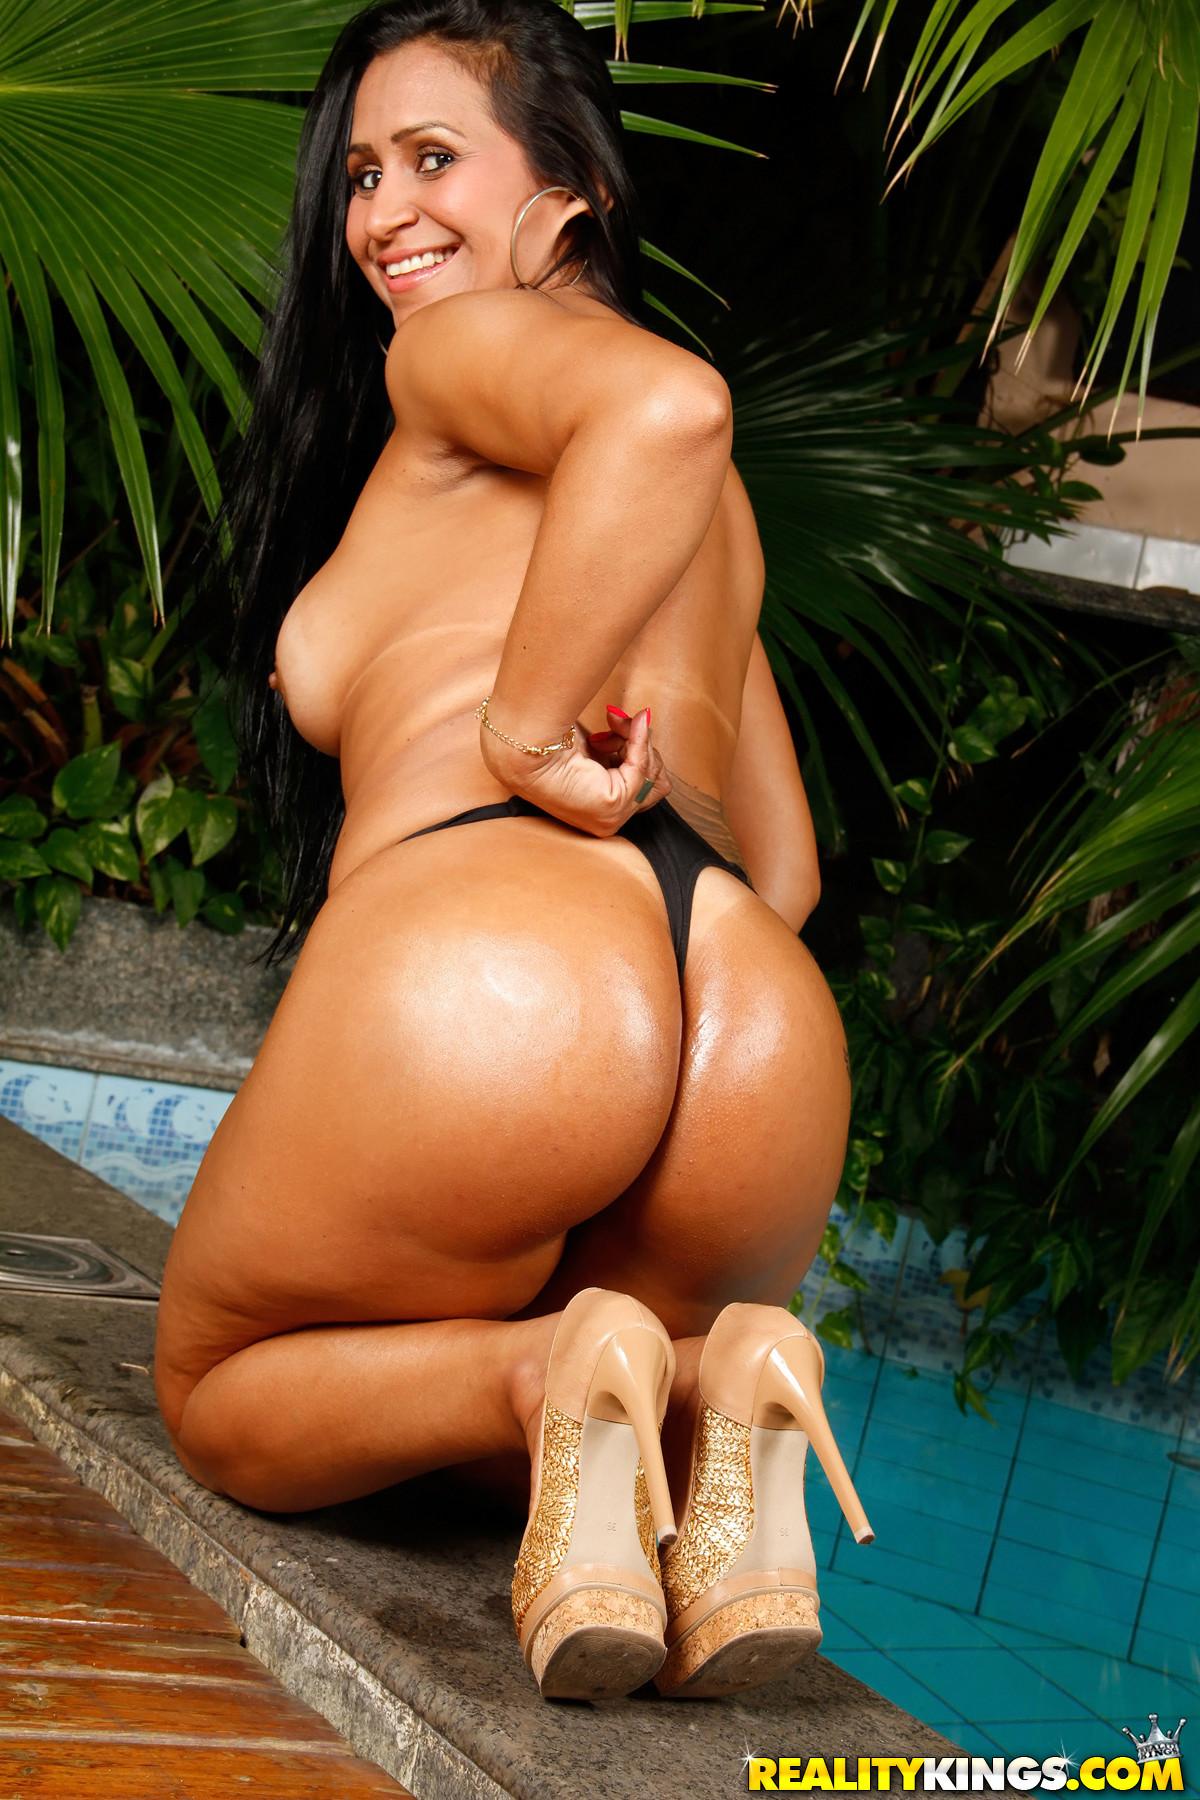 Alexandra - Amazing Ass - Mike In Brazil 61624-5869